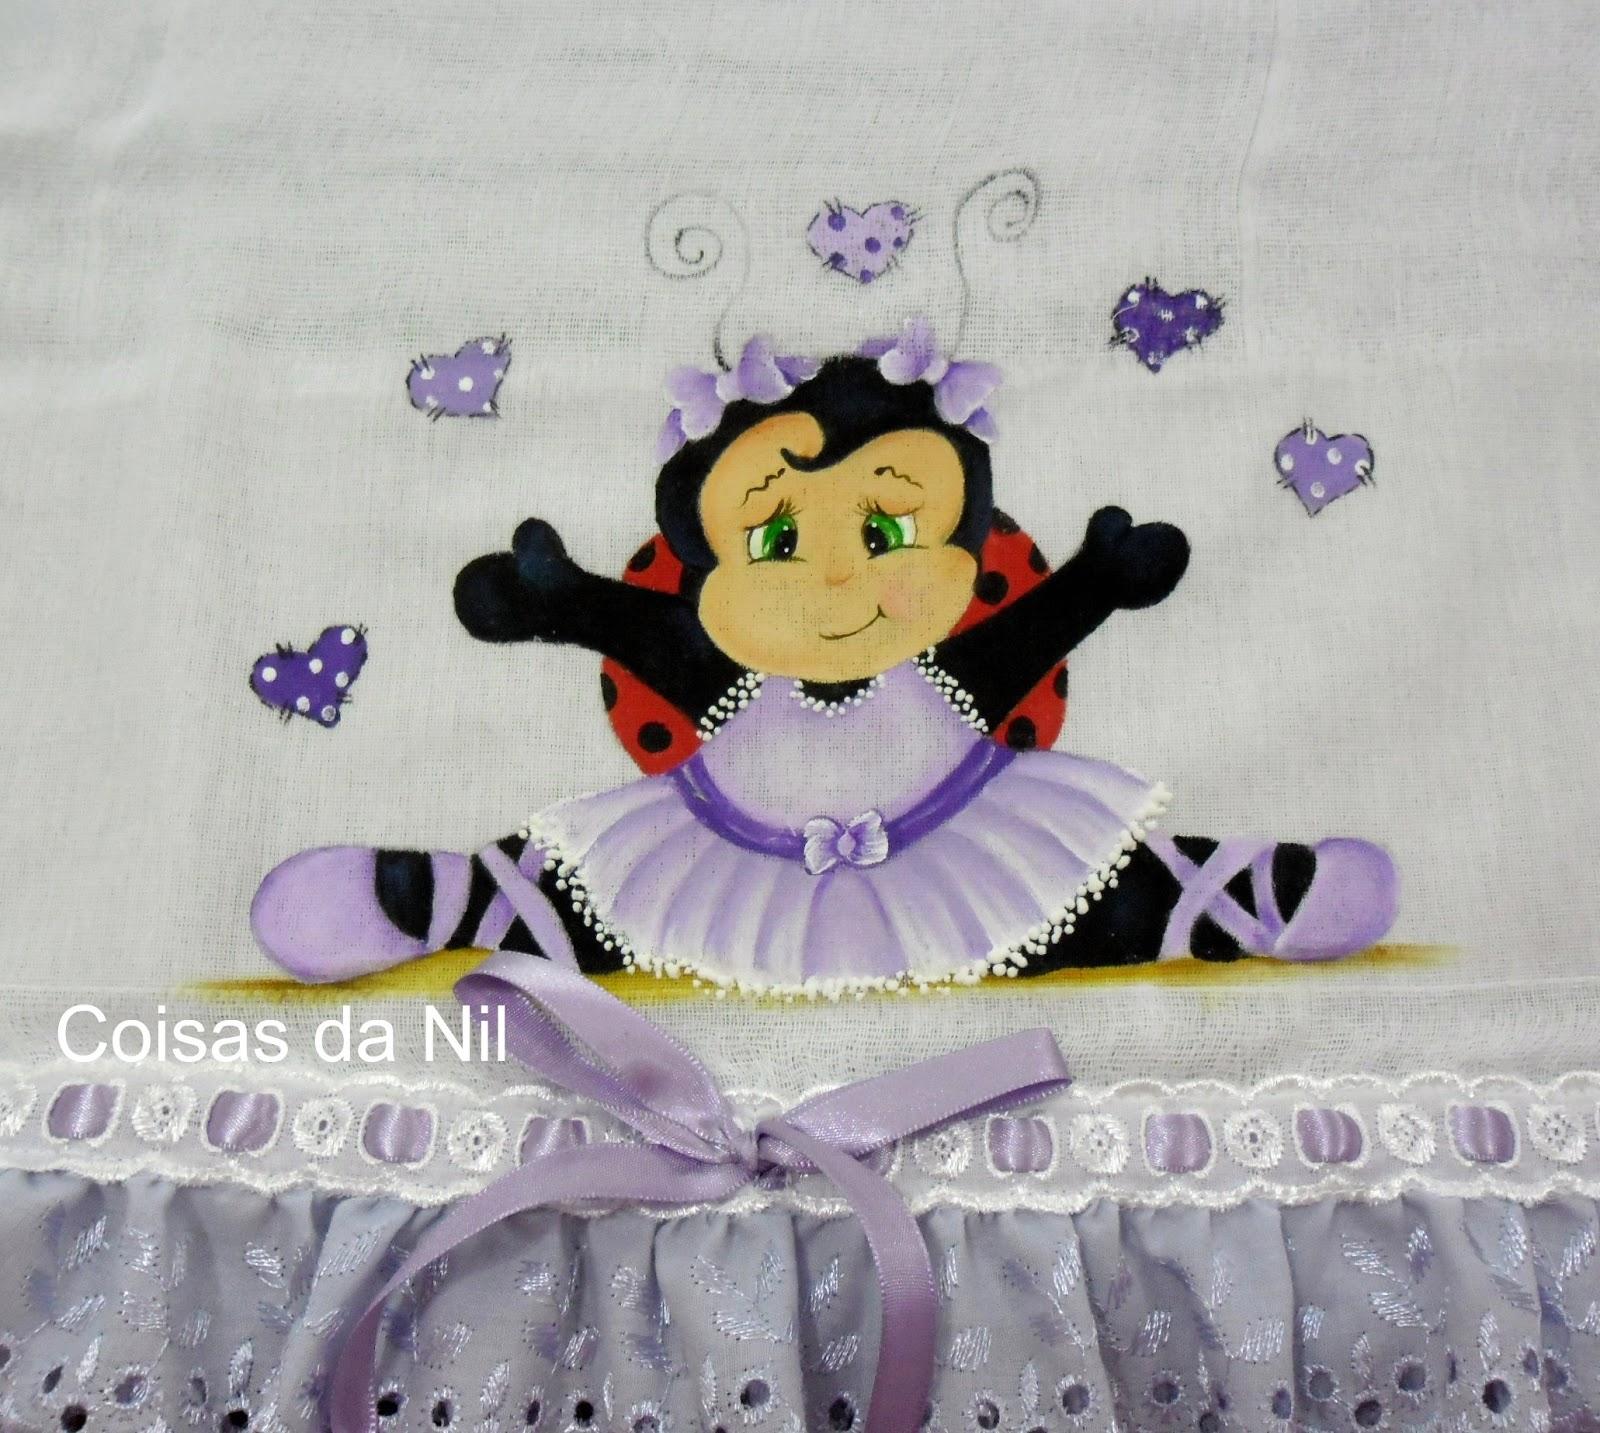 Nilzozo Blogspot   2012 11 Joaninha Lilas Html